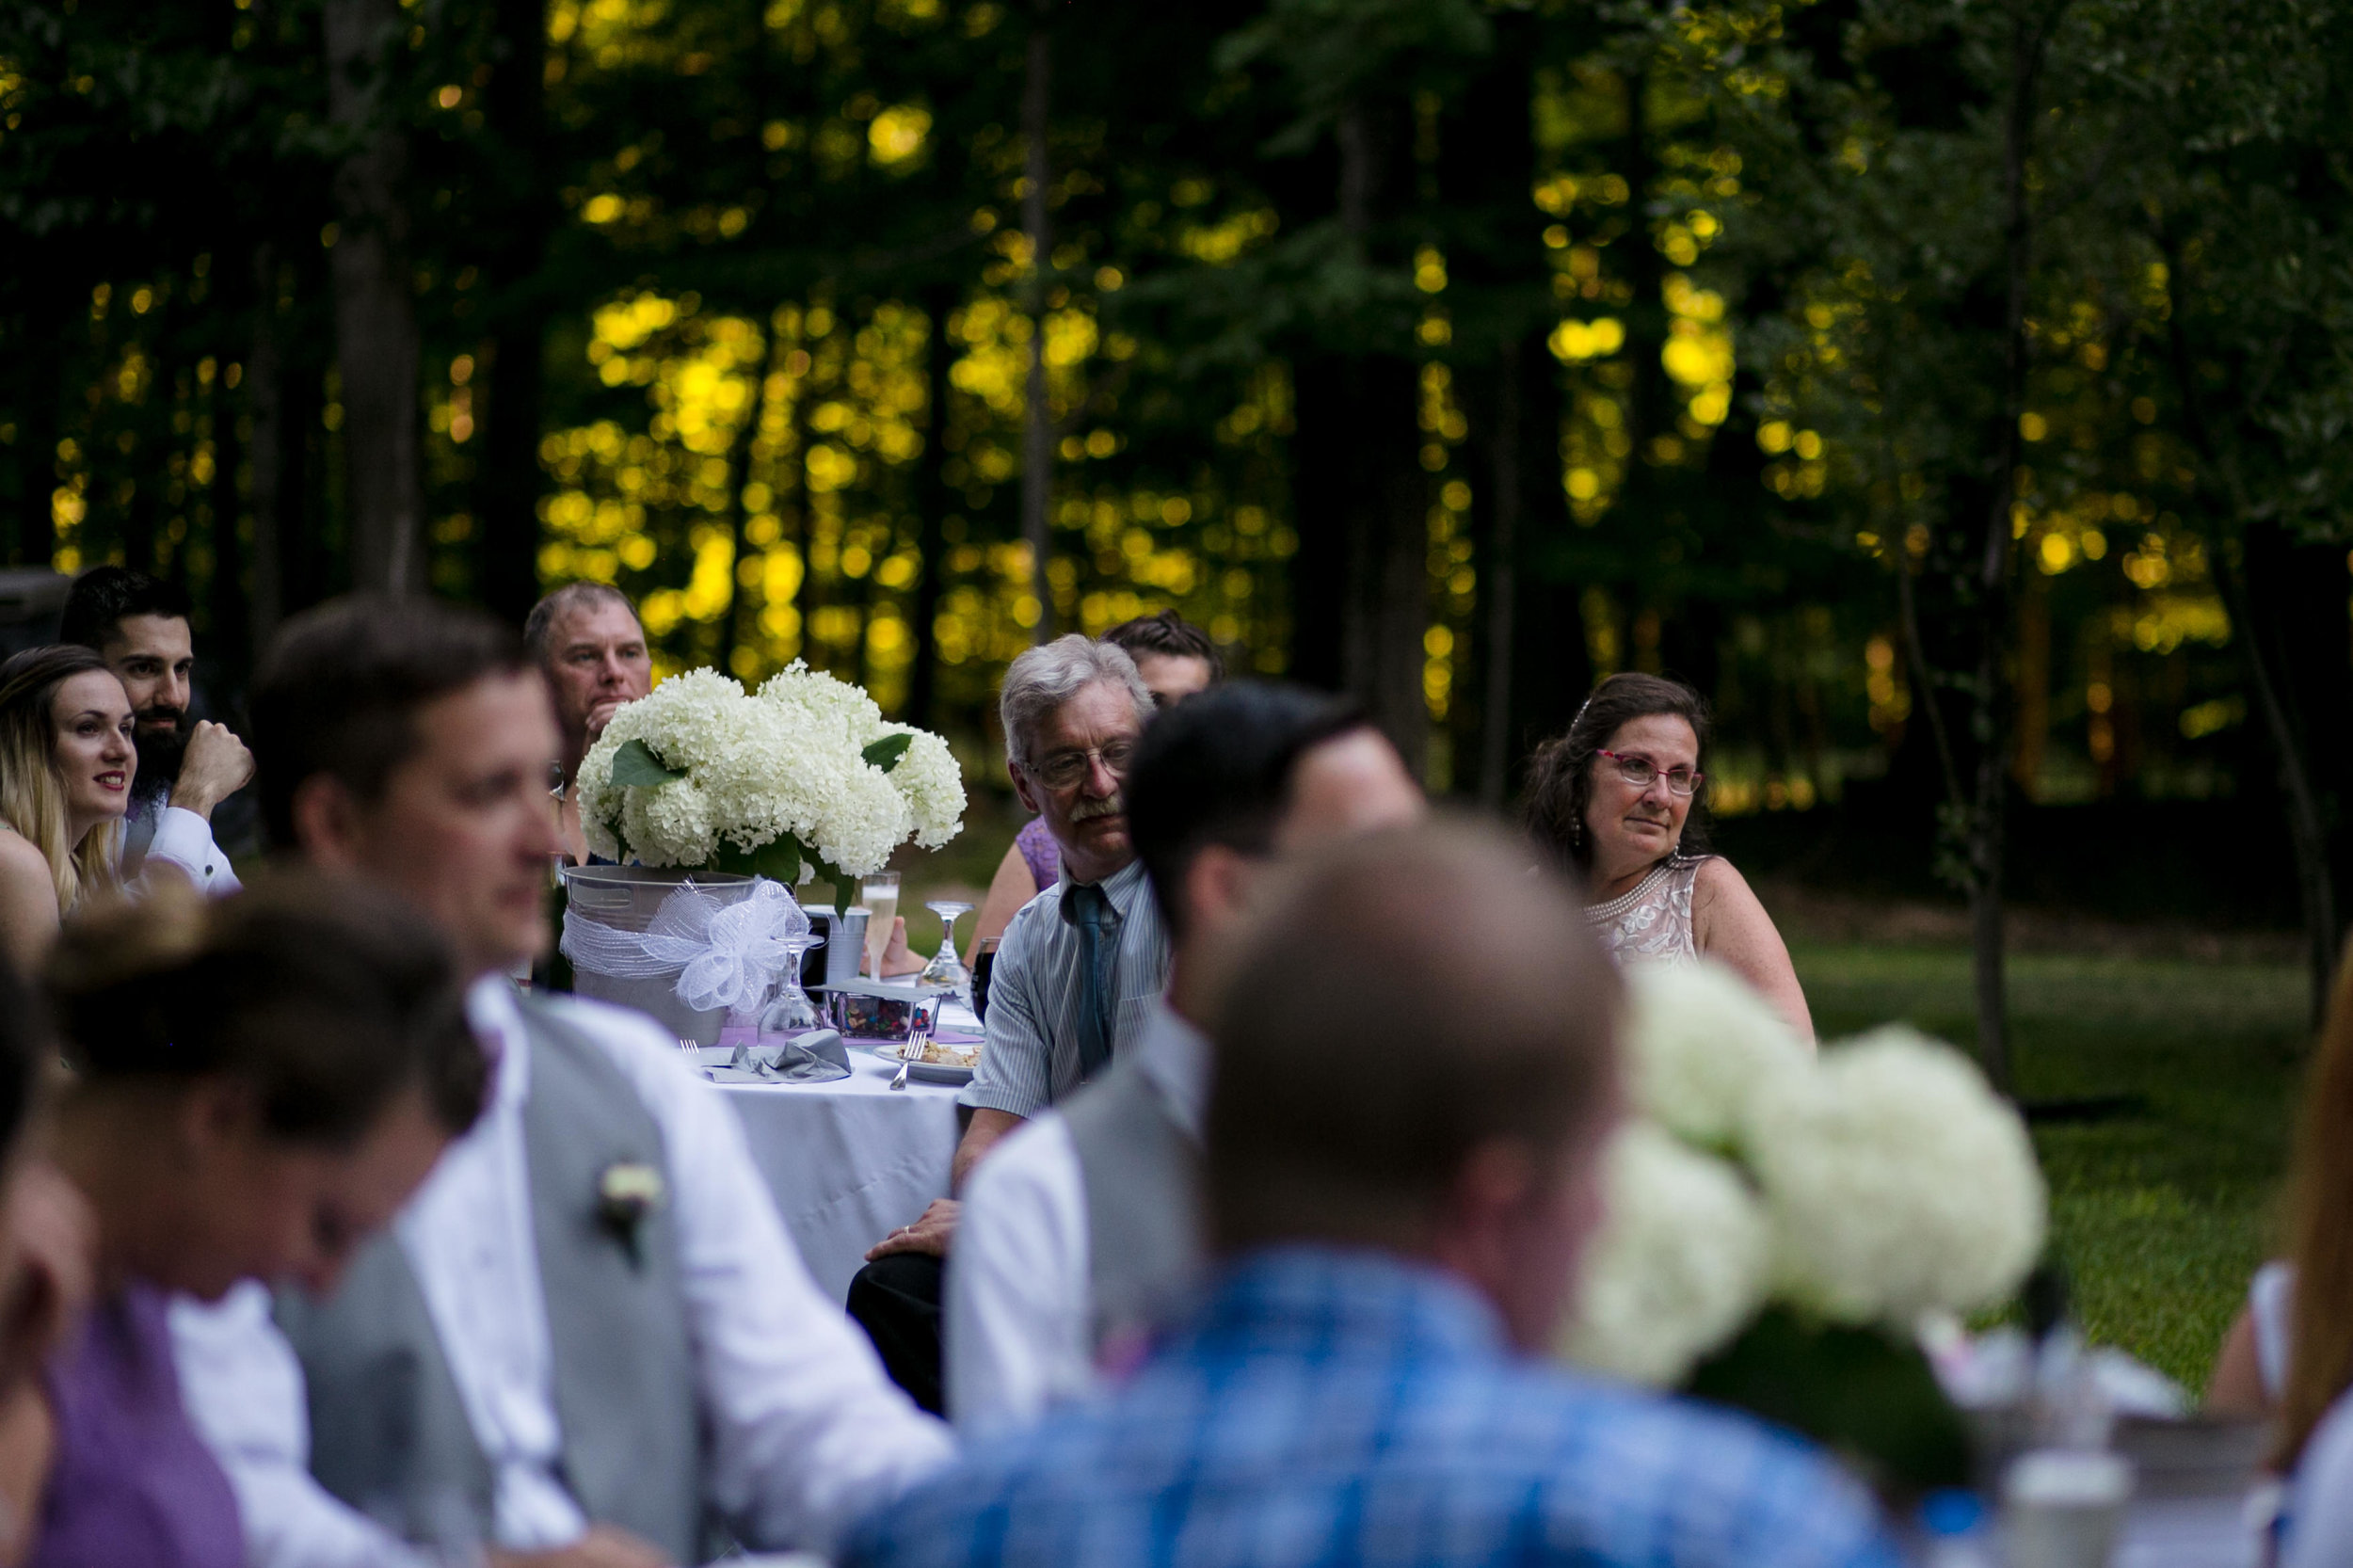 ludington-michigan-intimate-backyard-wedding-jessica-nolan406.jpg